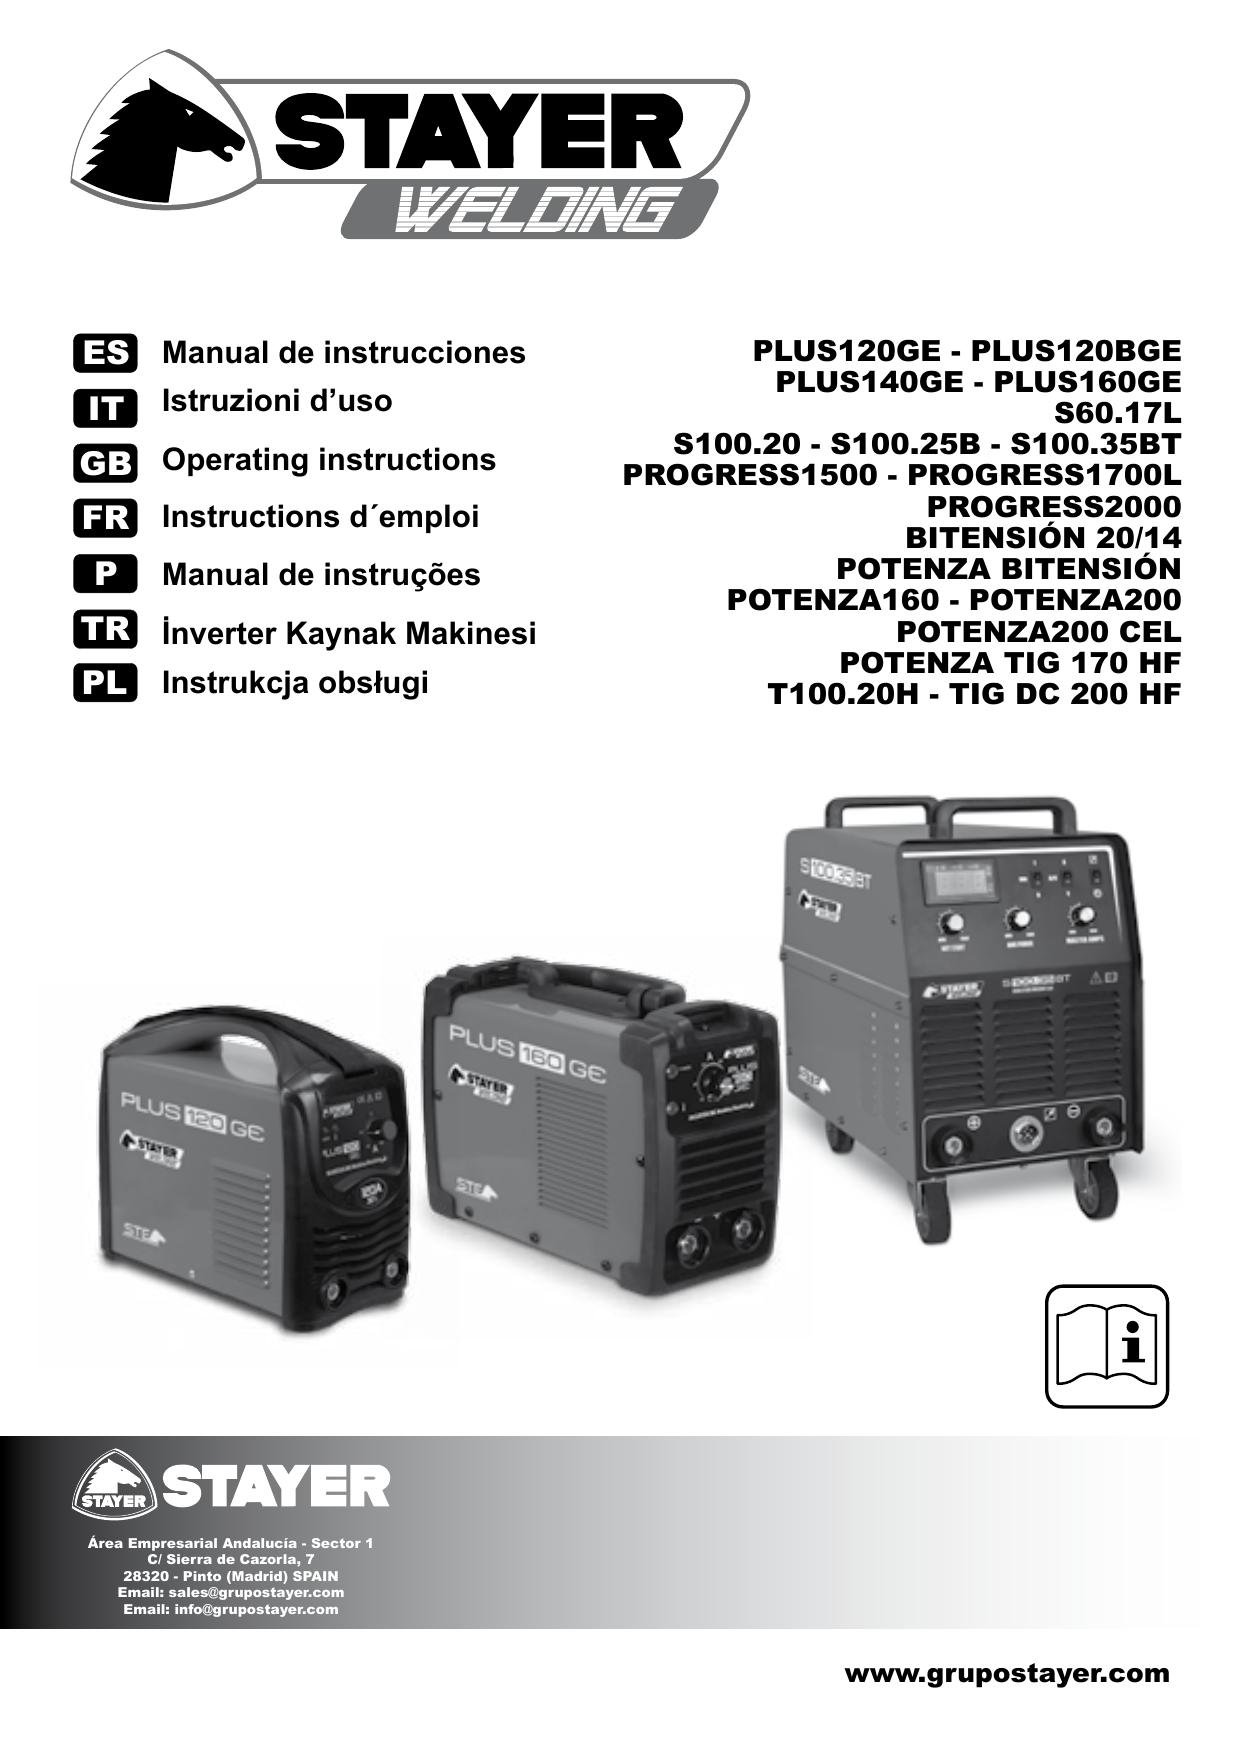 Stayer Welding/ /Power Tig 170/HF Inverter Tig Welding 170/ 60/% to 4/mm 5/kg Kva5